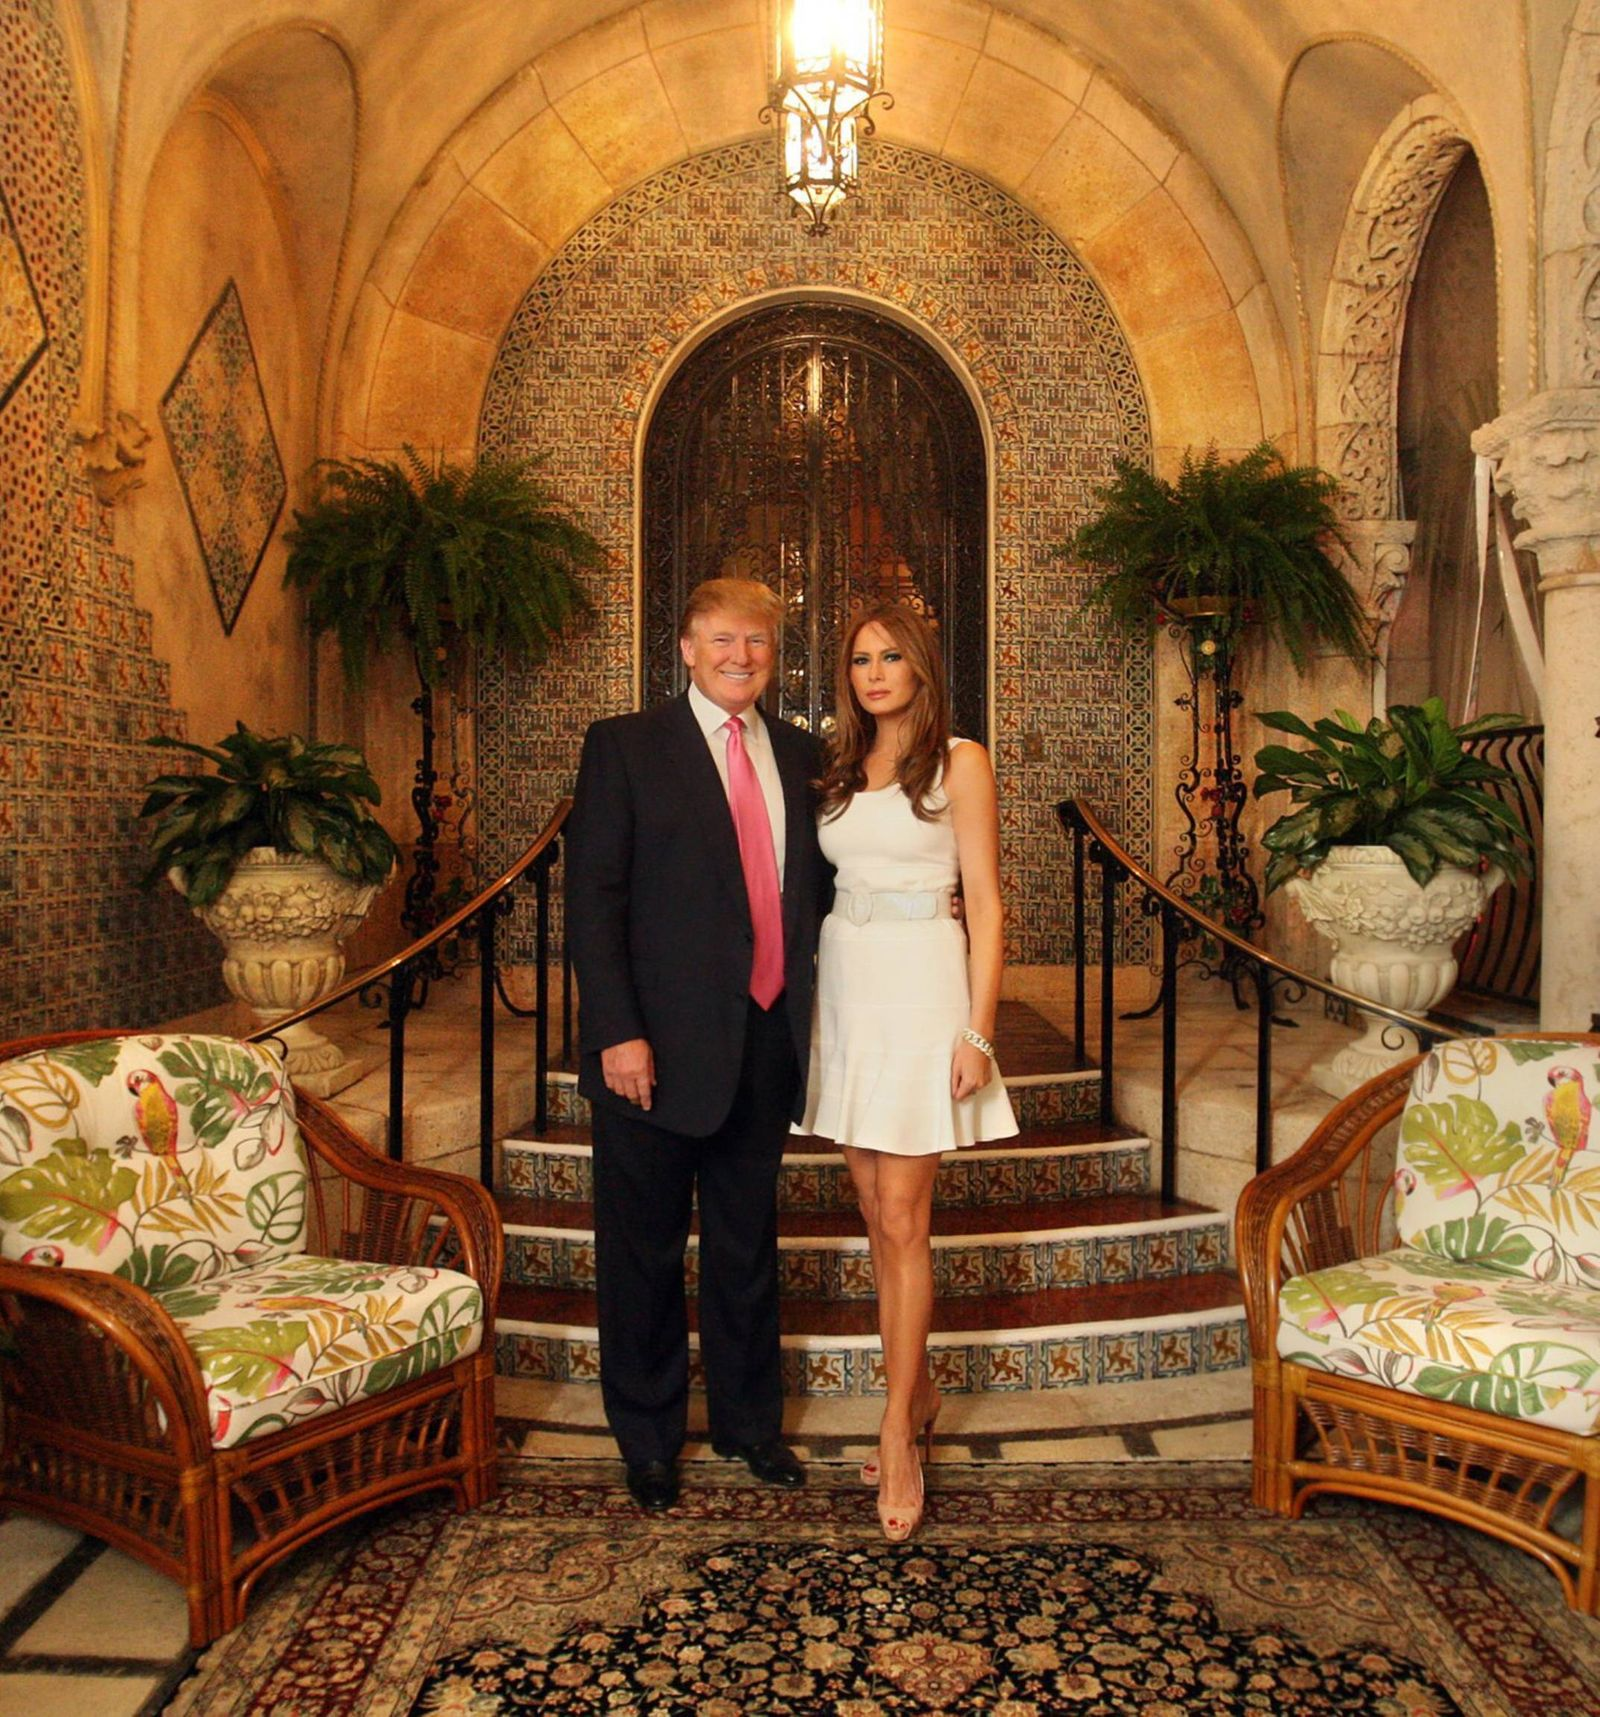 Themen der Woche November 9 2016 Florida U S Donald and Melania Trump pose for a photo in fro